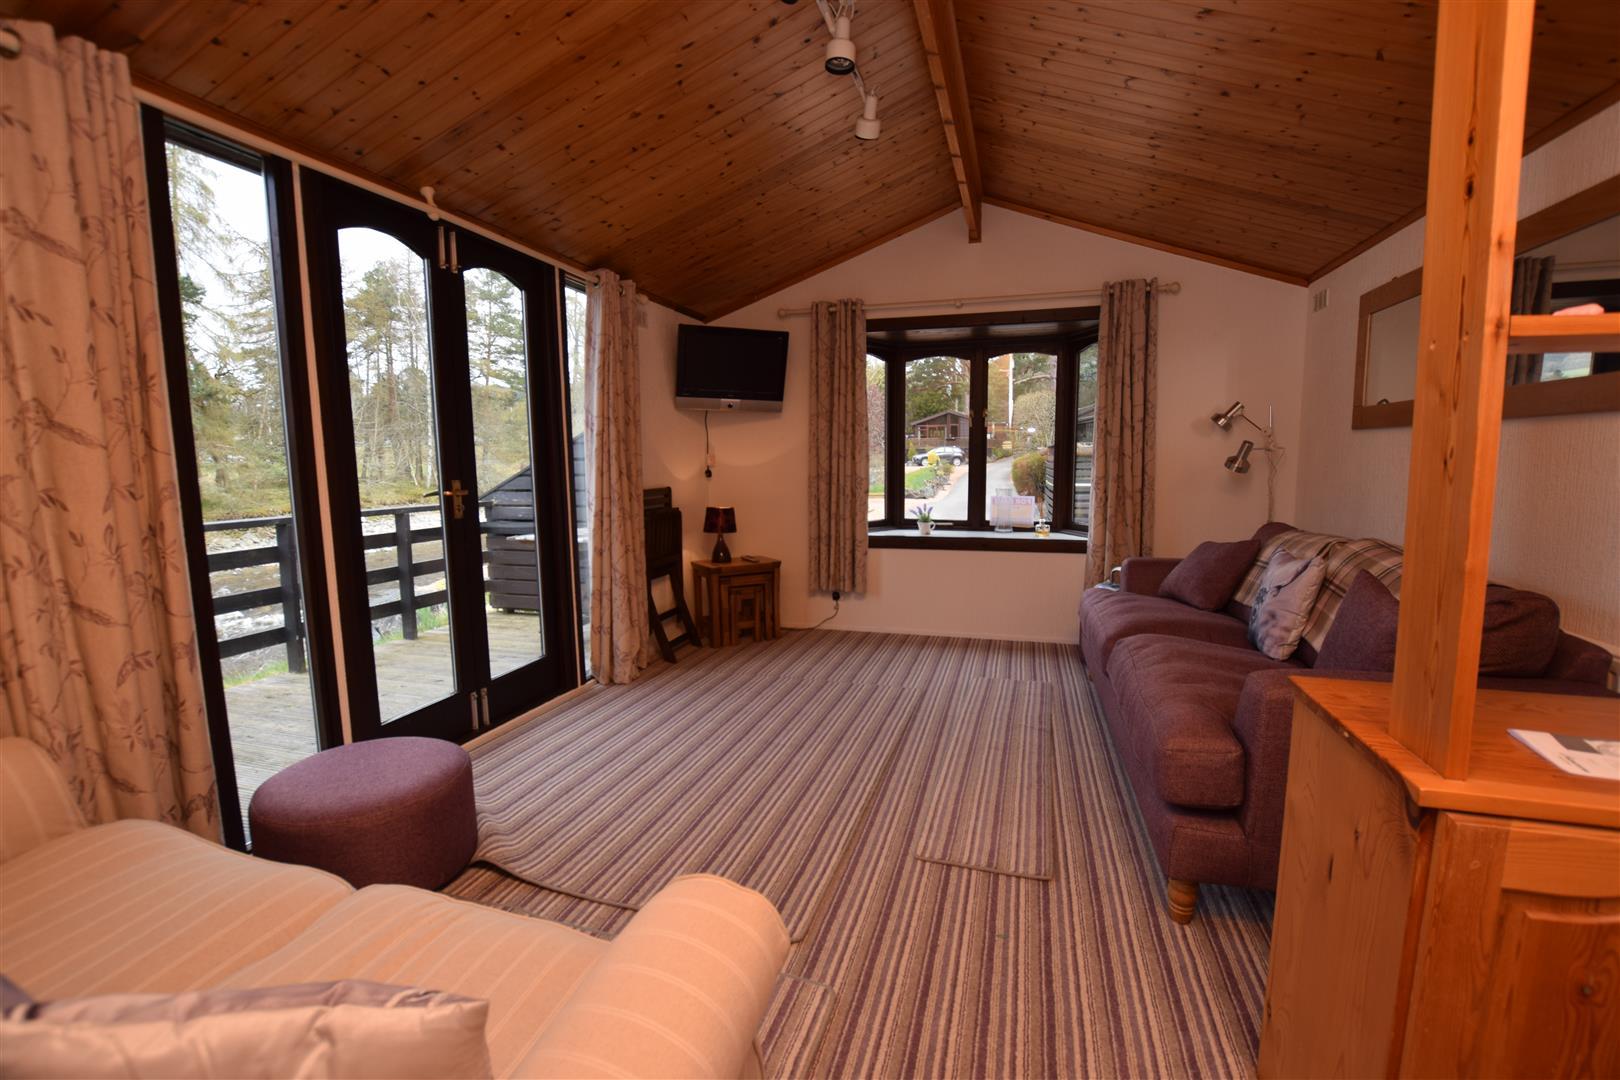 Otter Lodge, Lodge 16, River Tilt Leisure Park, Blair Atholl, Perthshire, PH18 5TE, UK